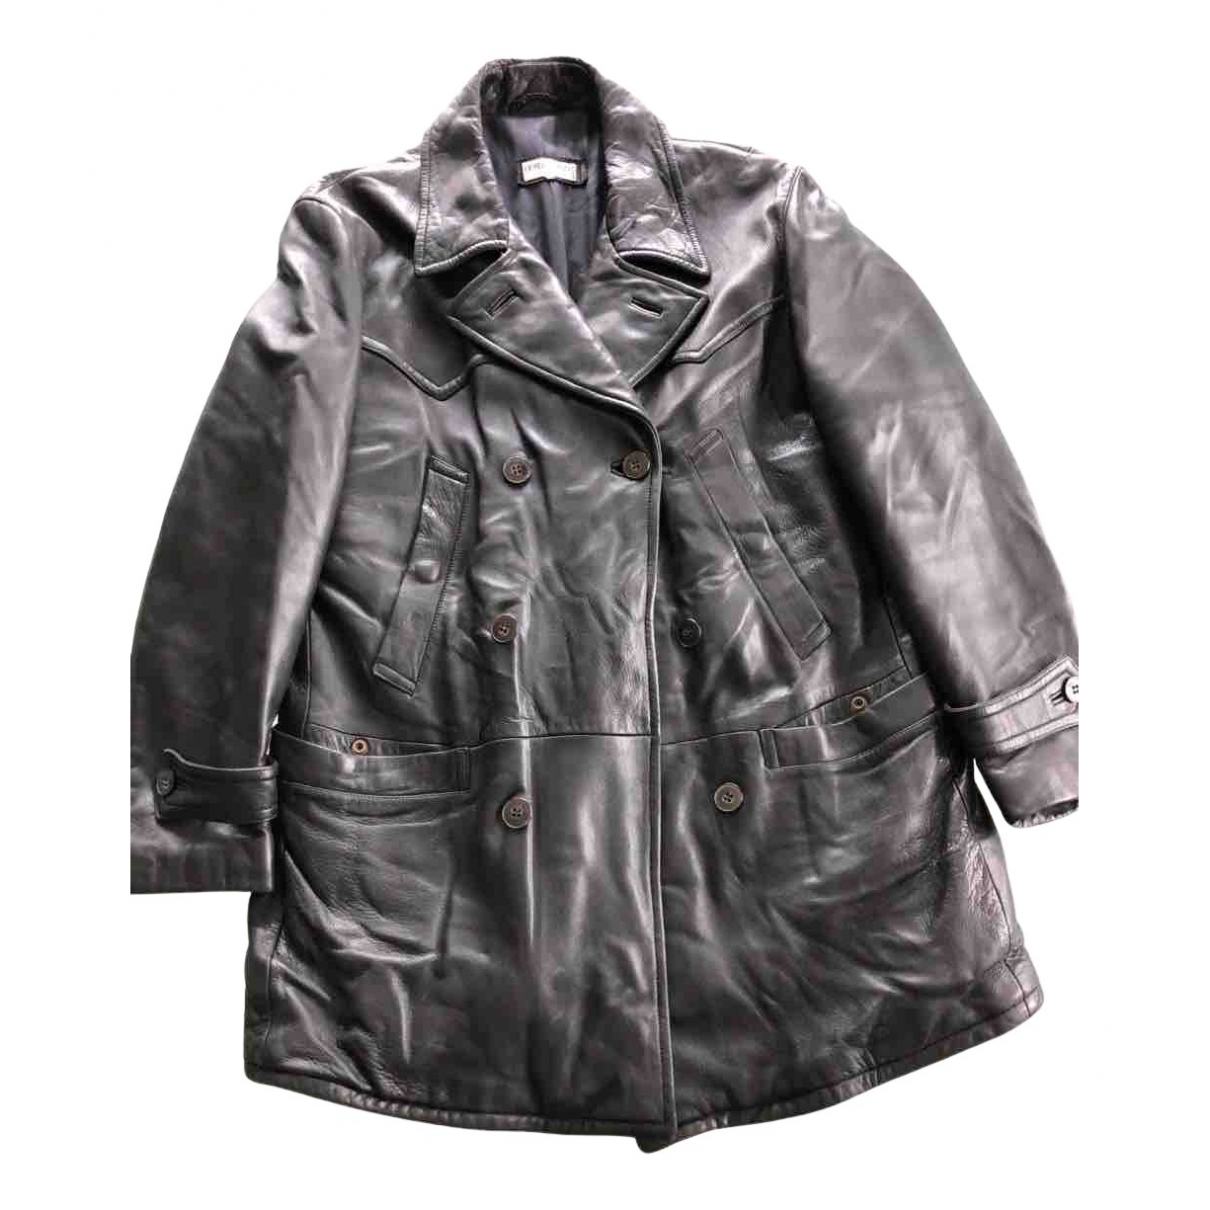 Giorgio Armani N Black Leather coat  for Men 40 UK - US